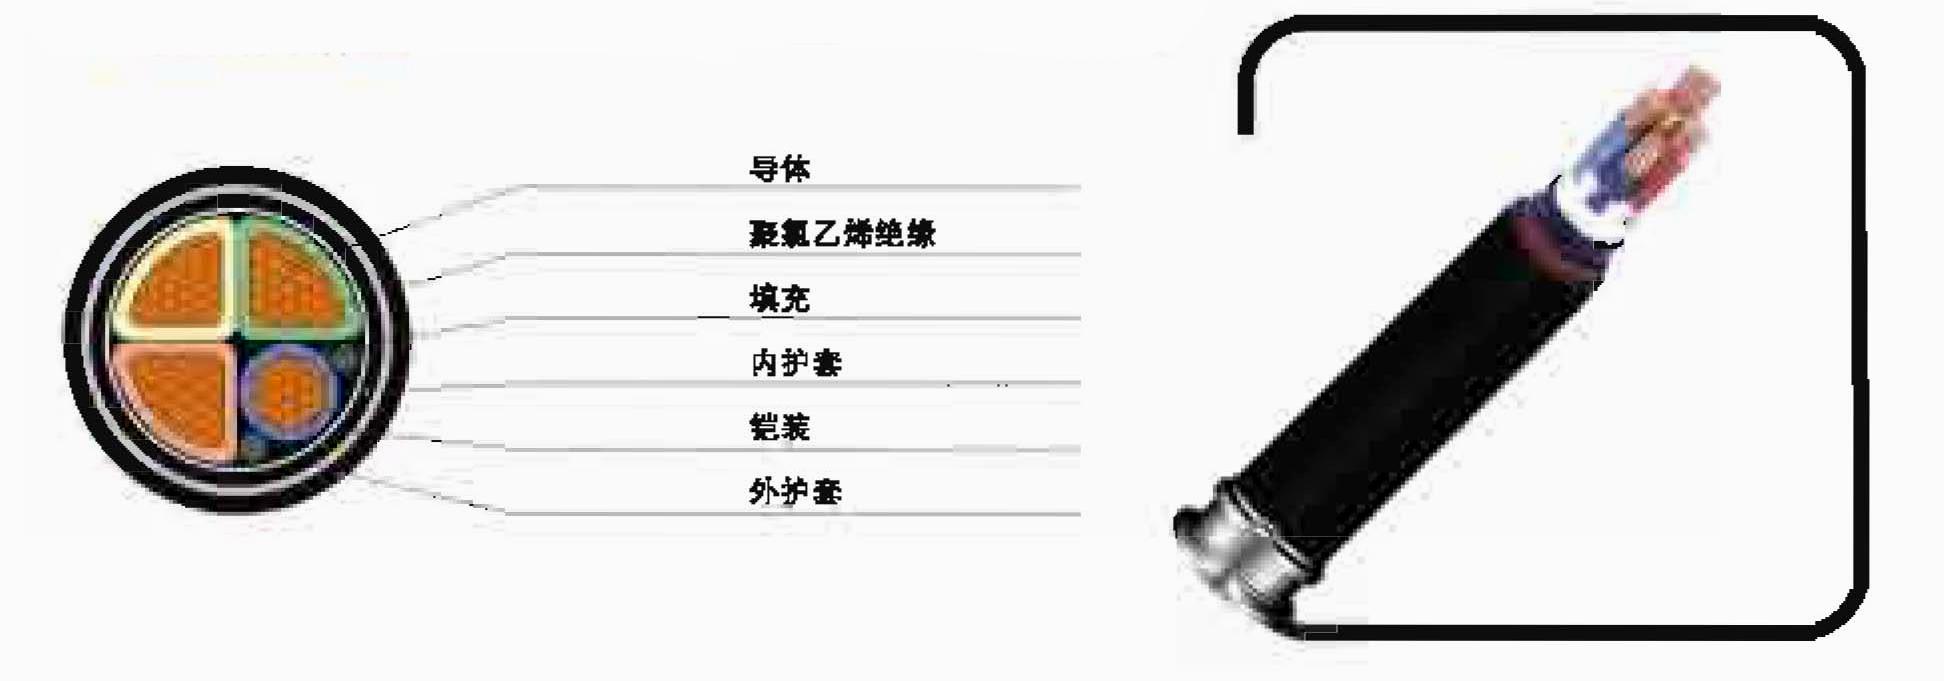 750V及以下聚氯乙烯雷竞技pc版电线雷竞技官网下载